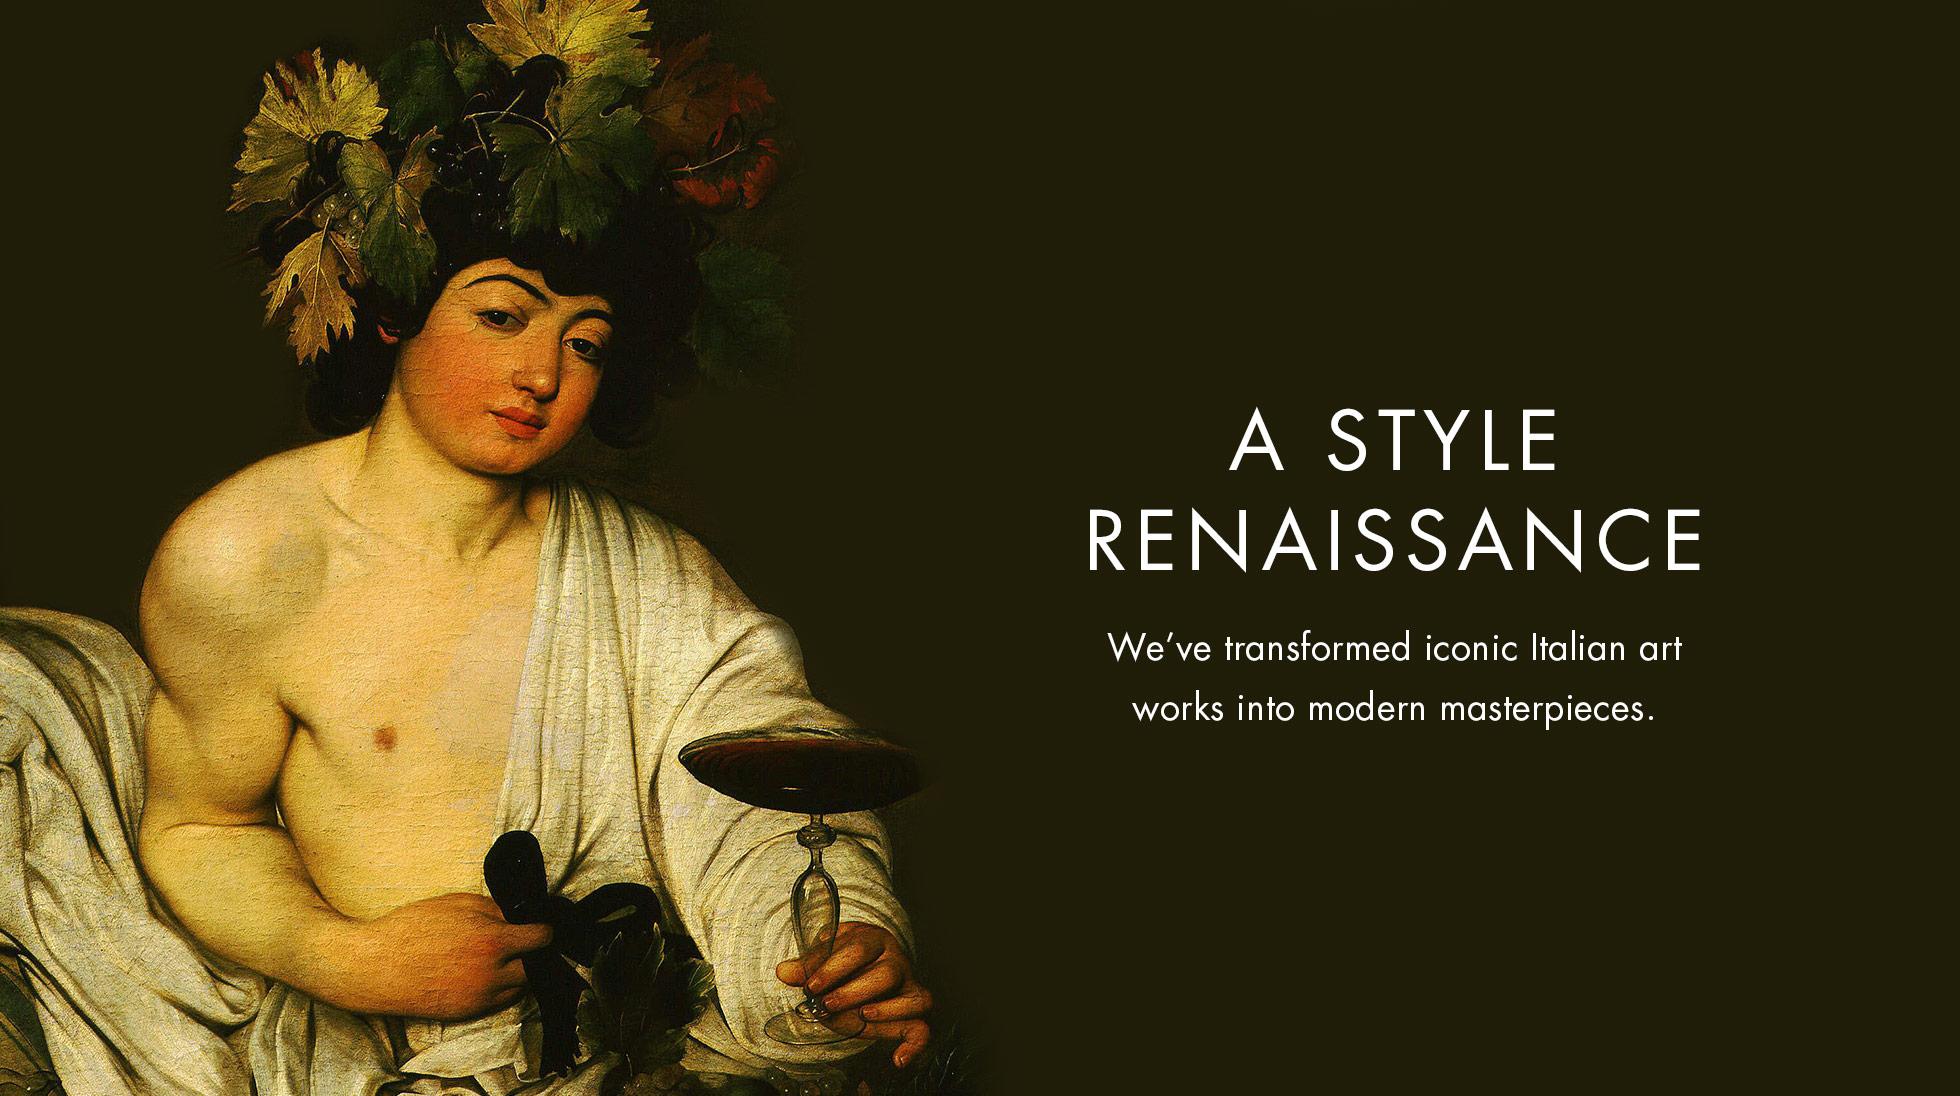 A Style Renaissance